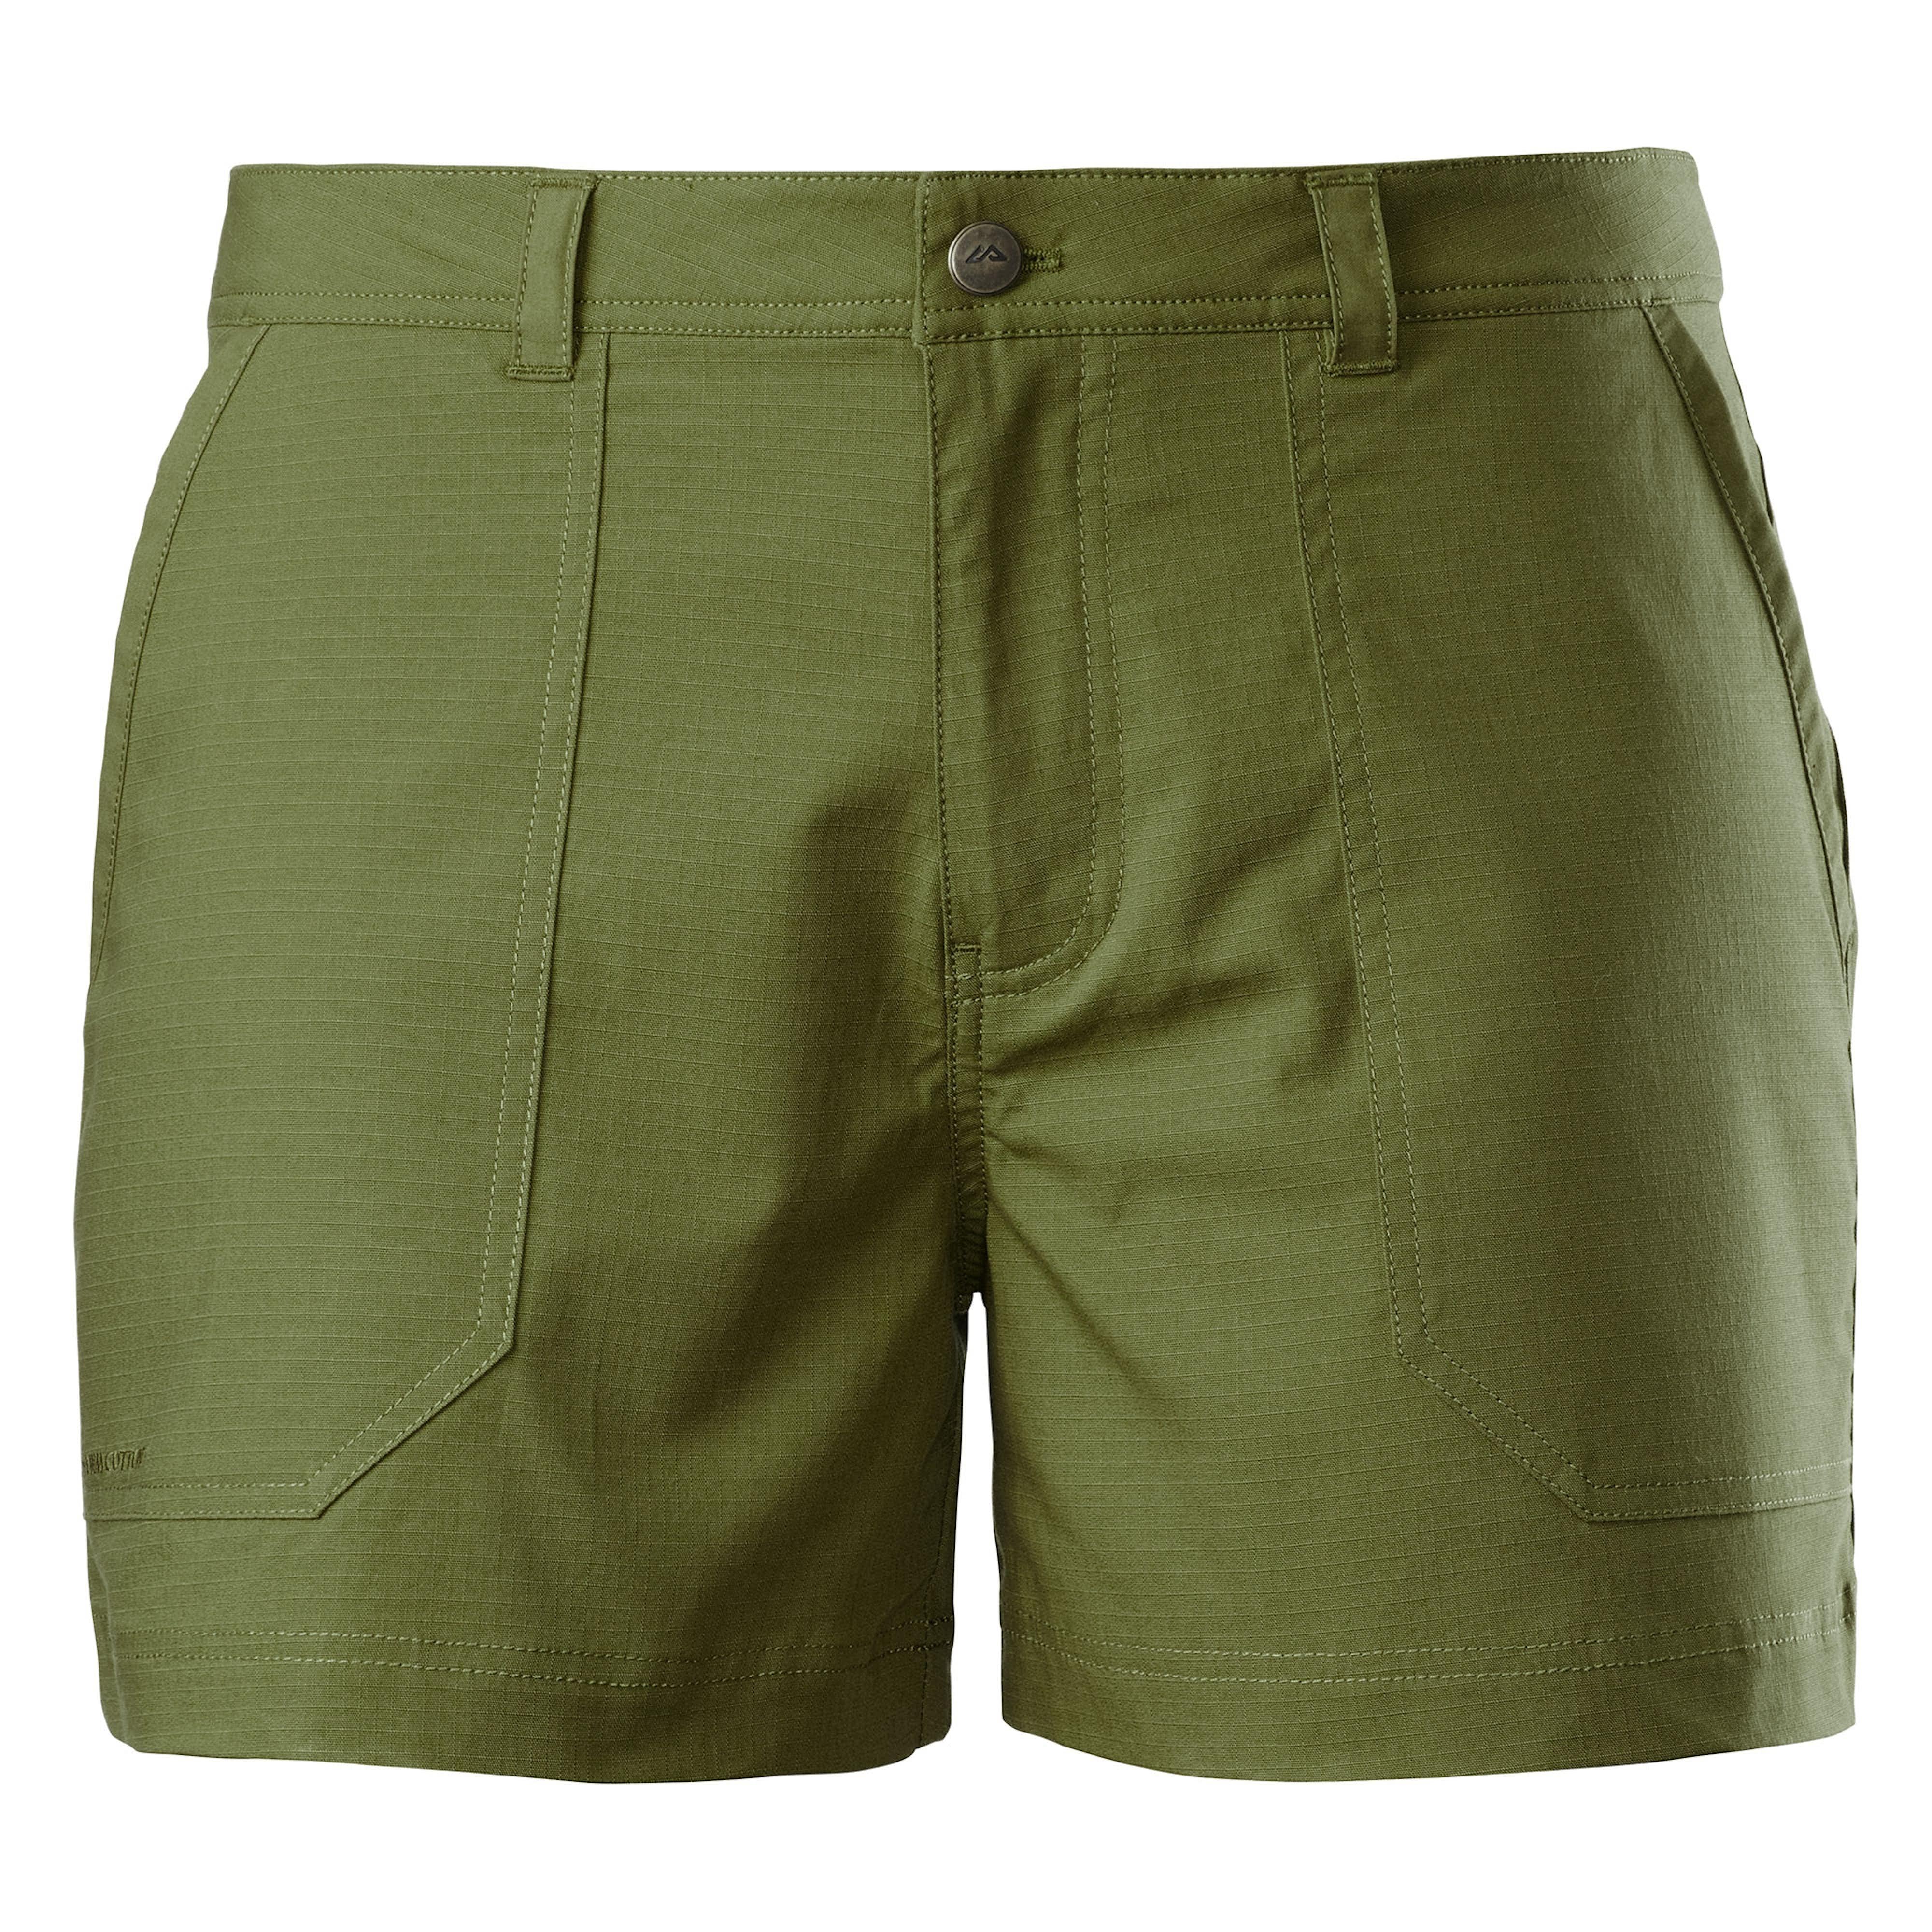 c30607ee24bb Womens Hiking Pants & Shorts | Travel Pants for Women | NZ